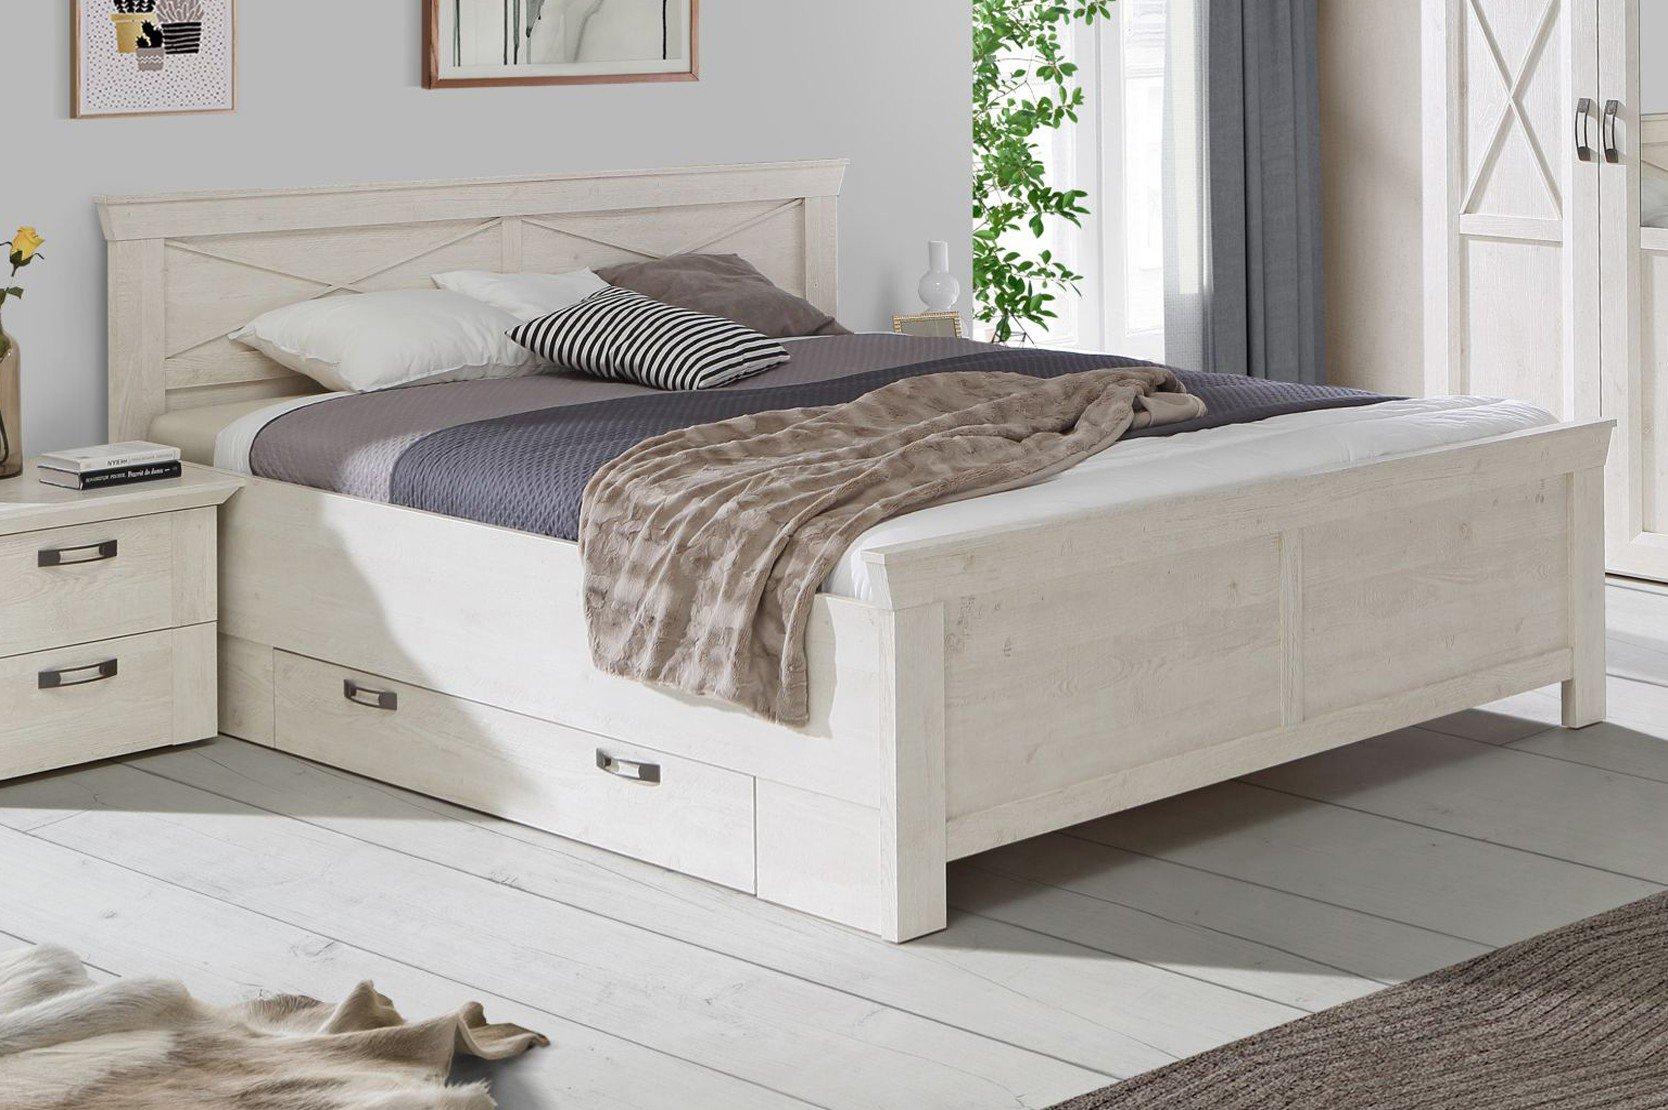 forte kashmir schlafzimmer wei pinia m bel letz ihr online shop. Black Bedroom Furniture Sets. Home Design Ideas